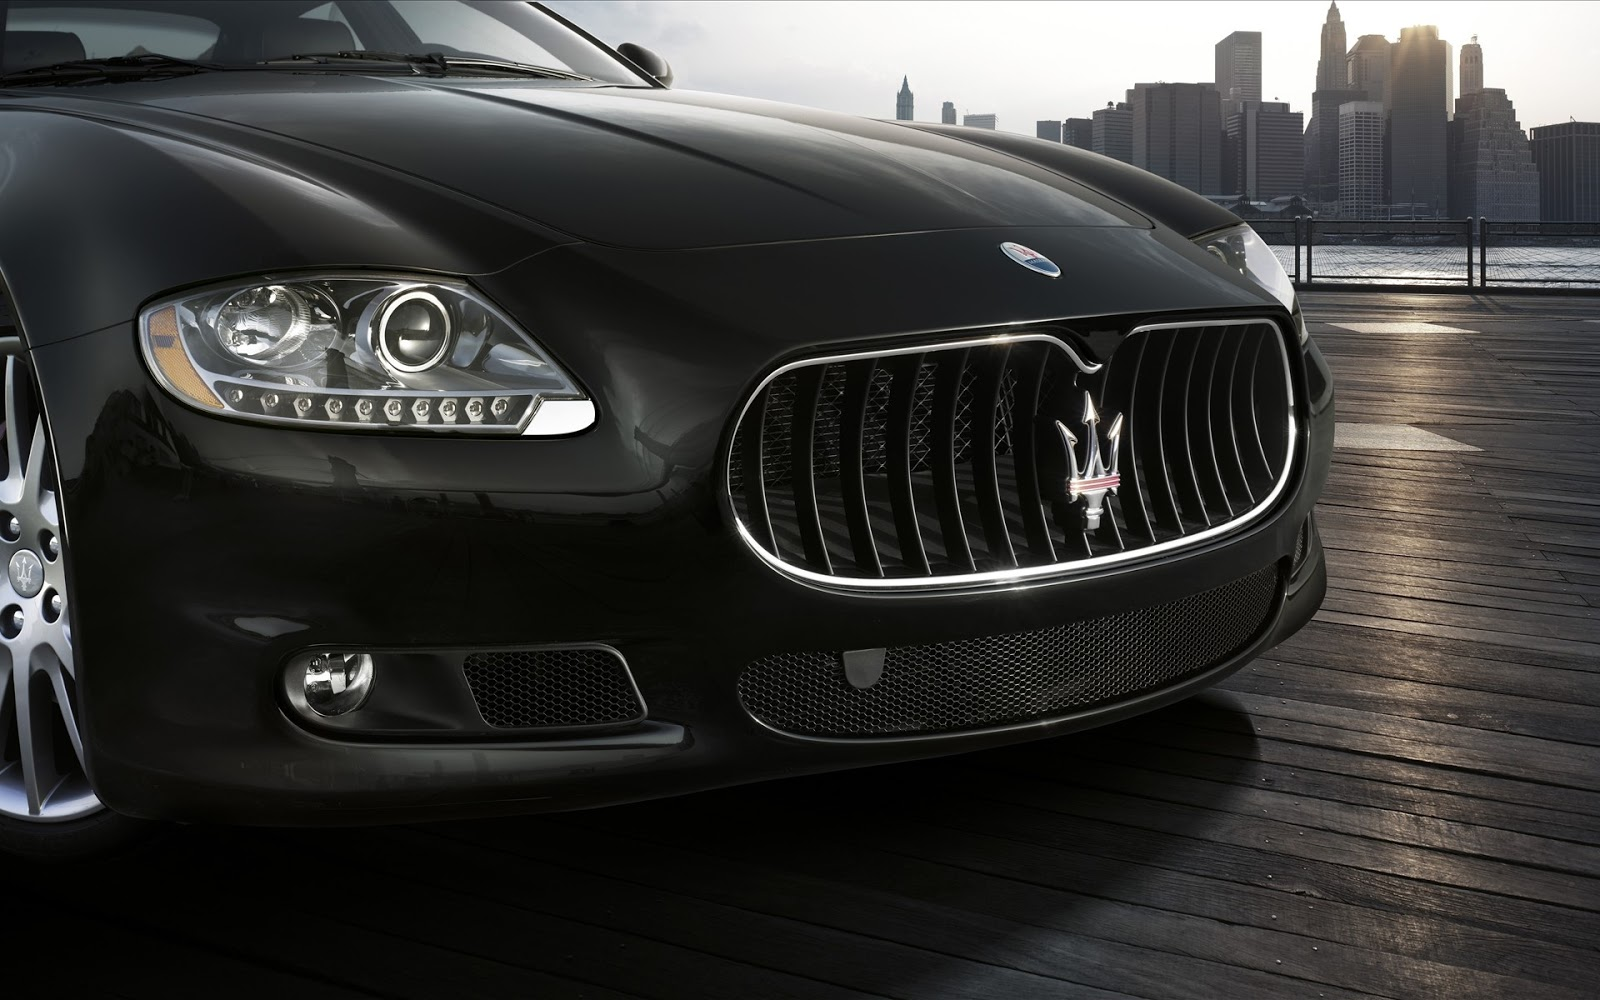 Hd Car Wallpapers Maserati Grille Logo Wallpaper